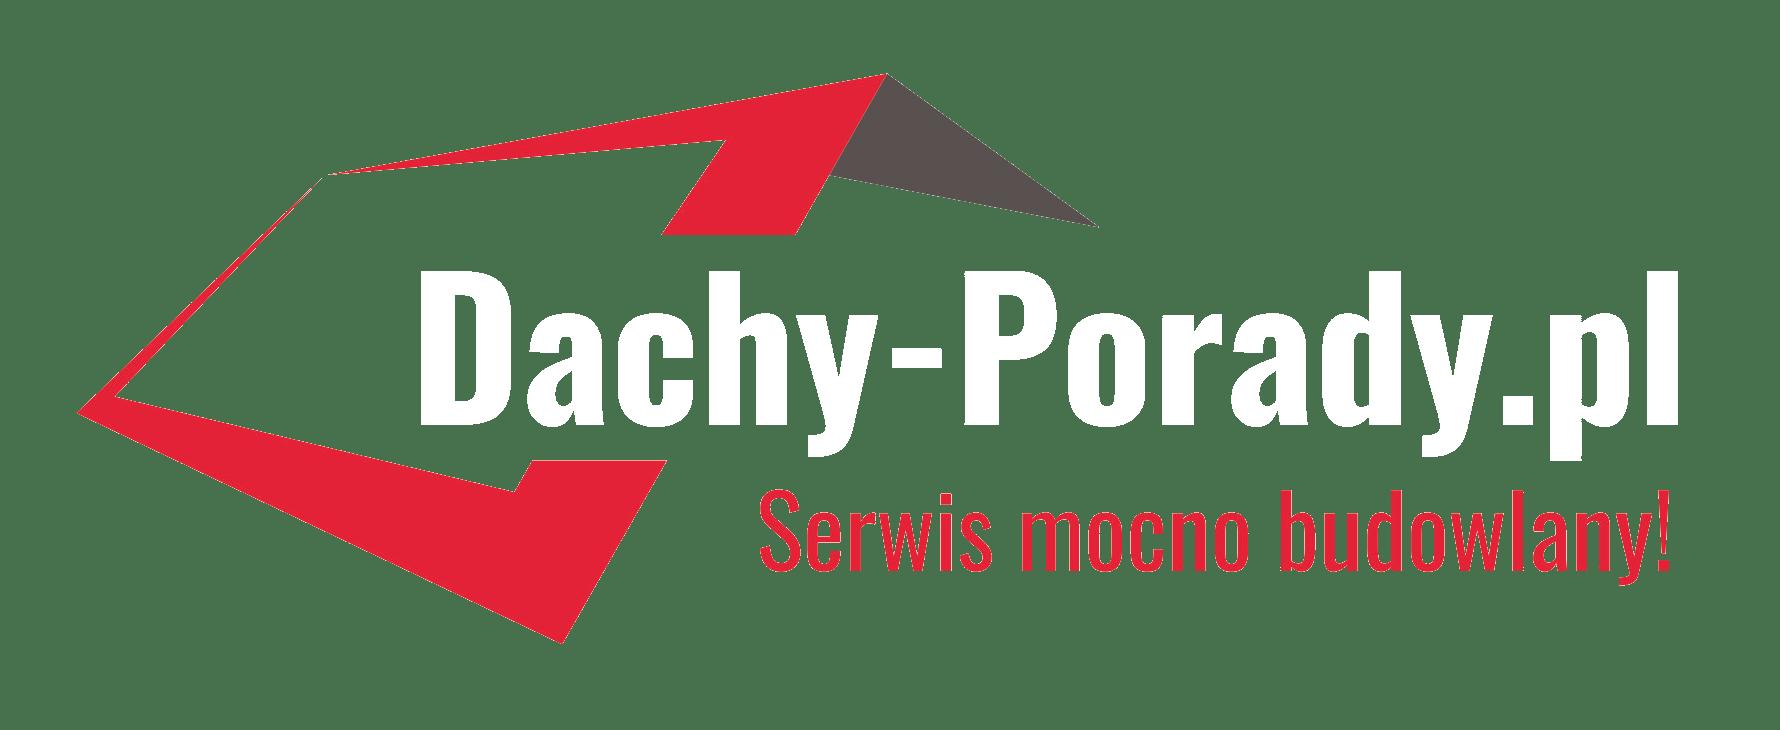 Dachy-Porady.pl